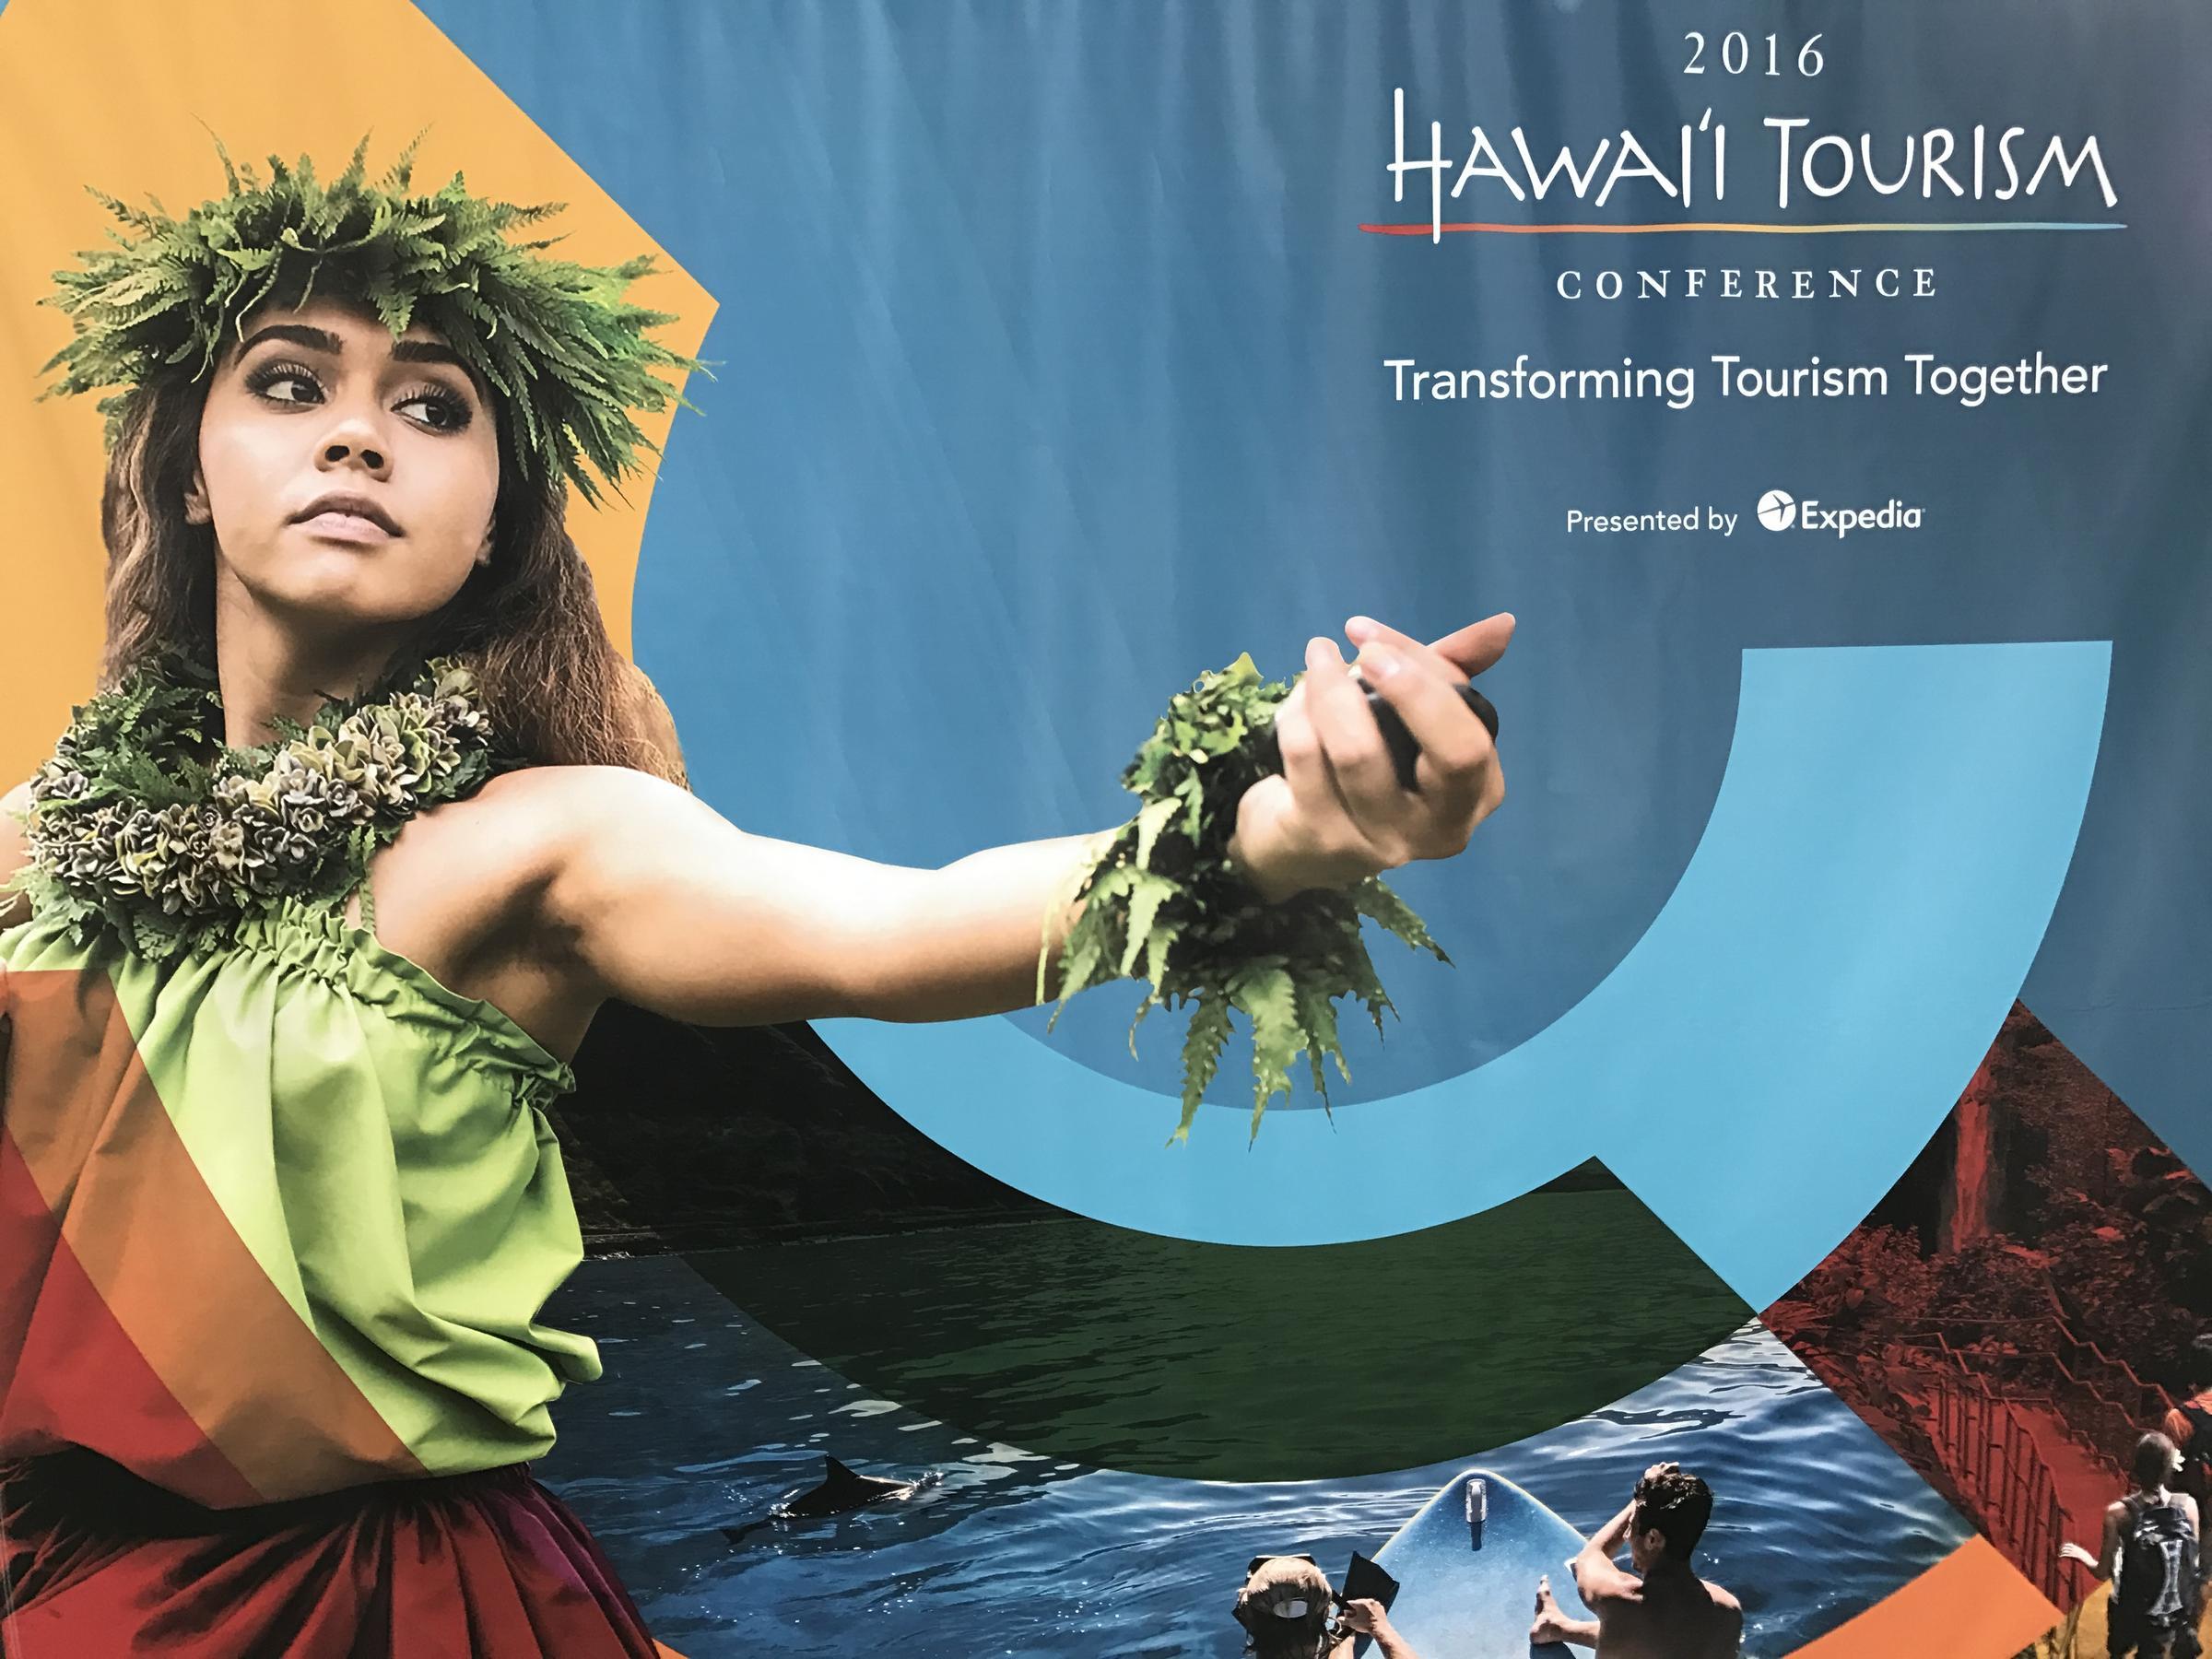 Hawai'i Tourism Conference: The Digital Age | Hawaii